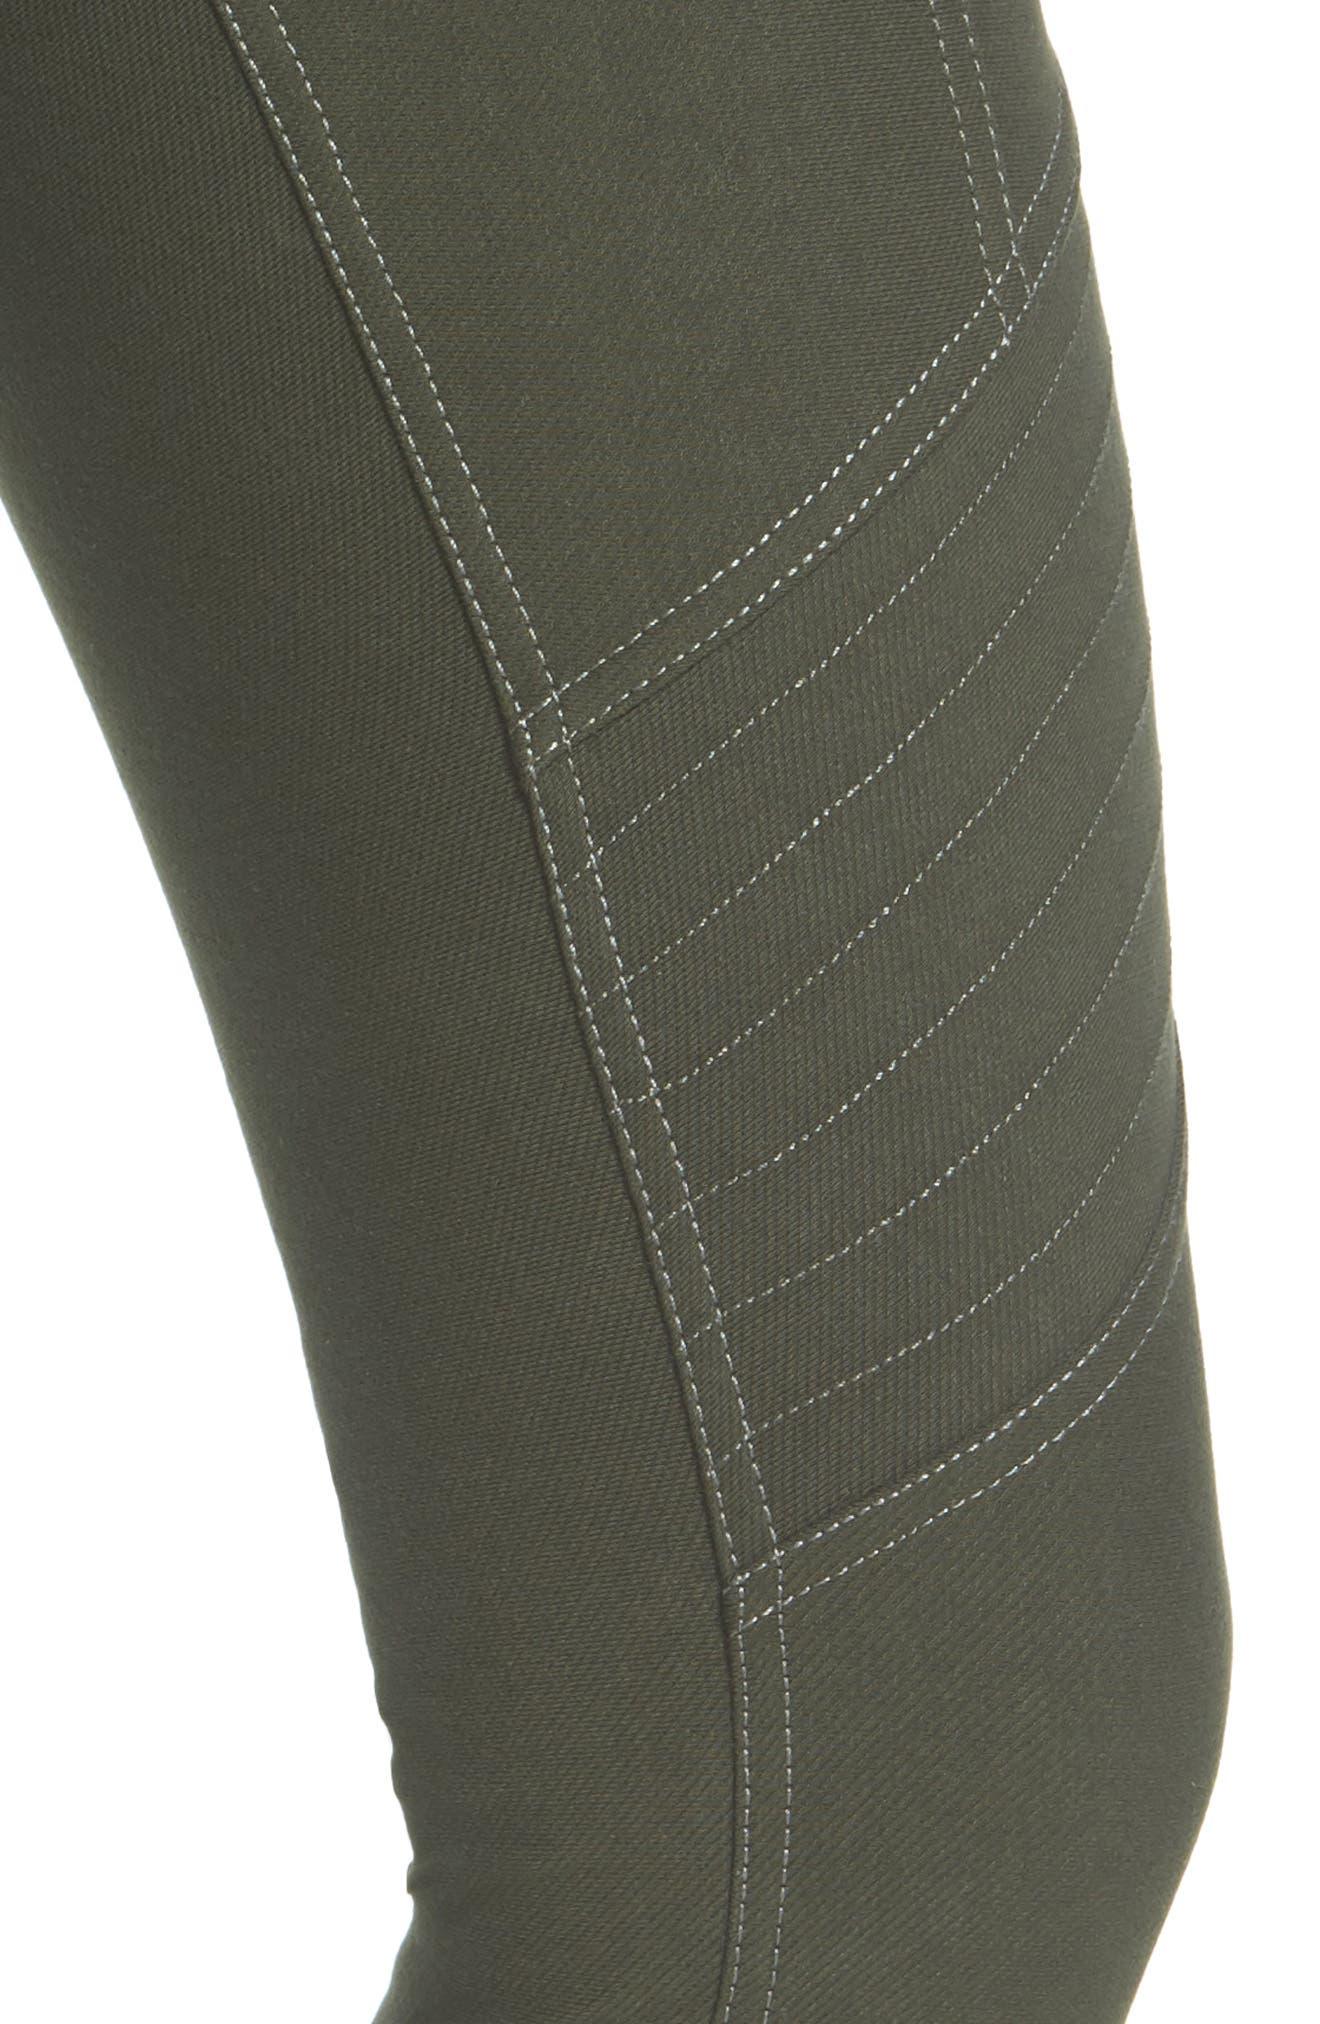 Essential Denim Moto Leggings,                             Alternate thumbnail 5, color,                             Olive